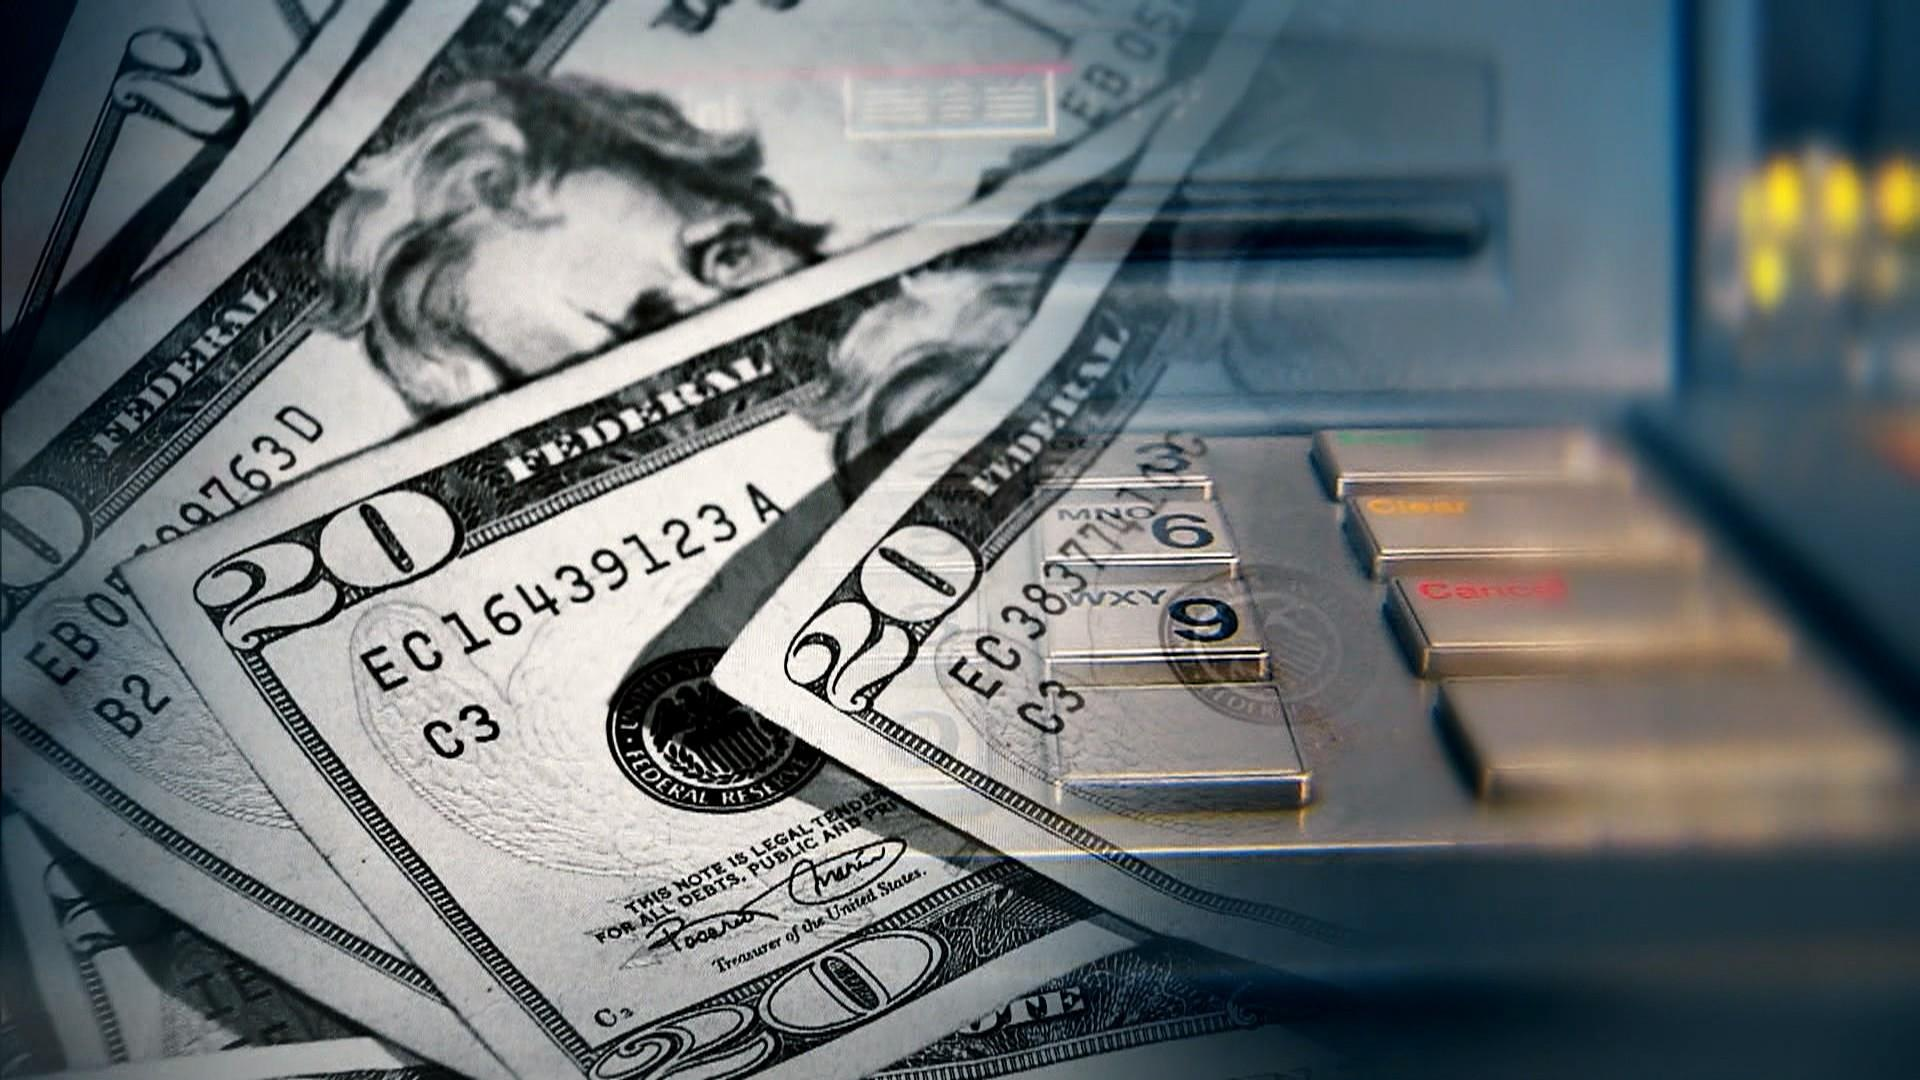 tdy_money_tom_atm_180129_1920x1080 (1).jpg